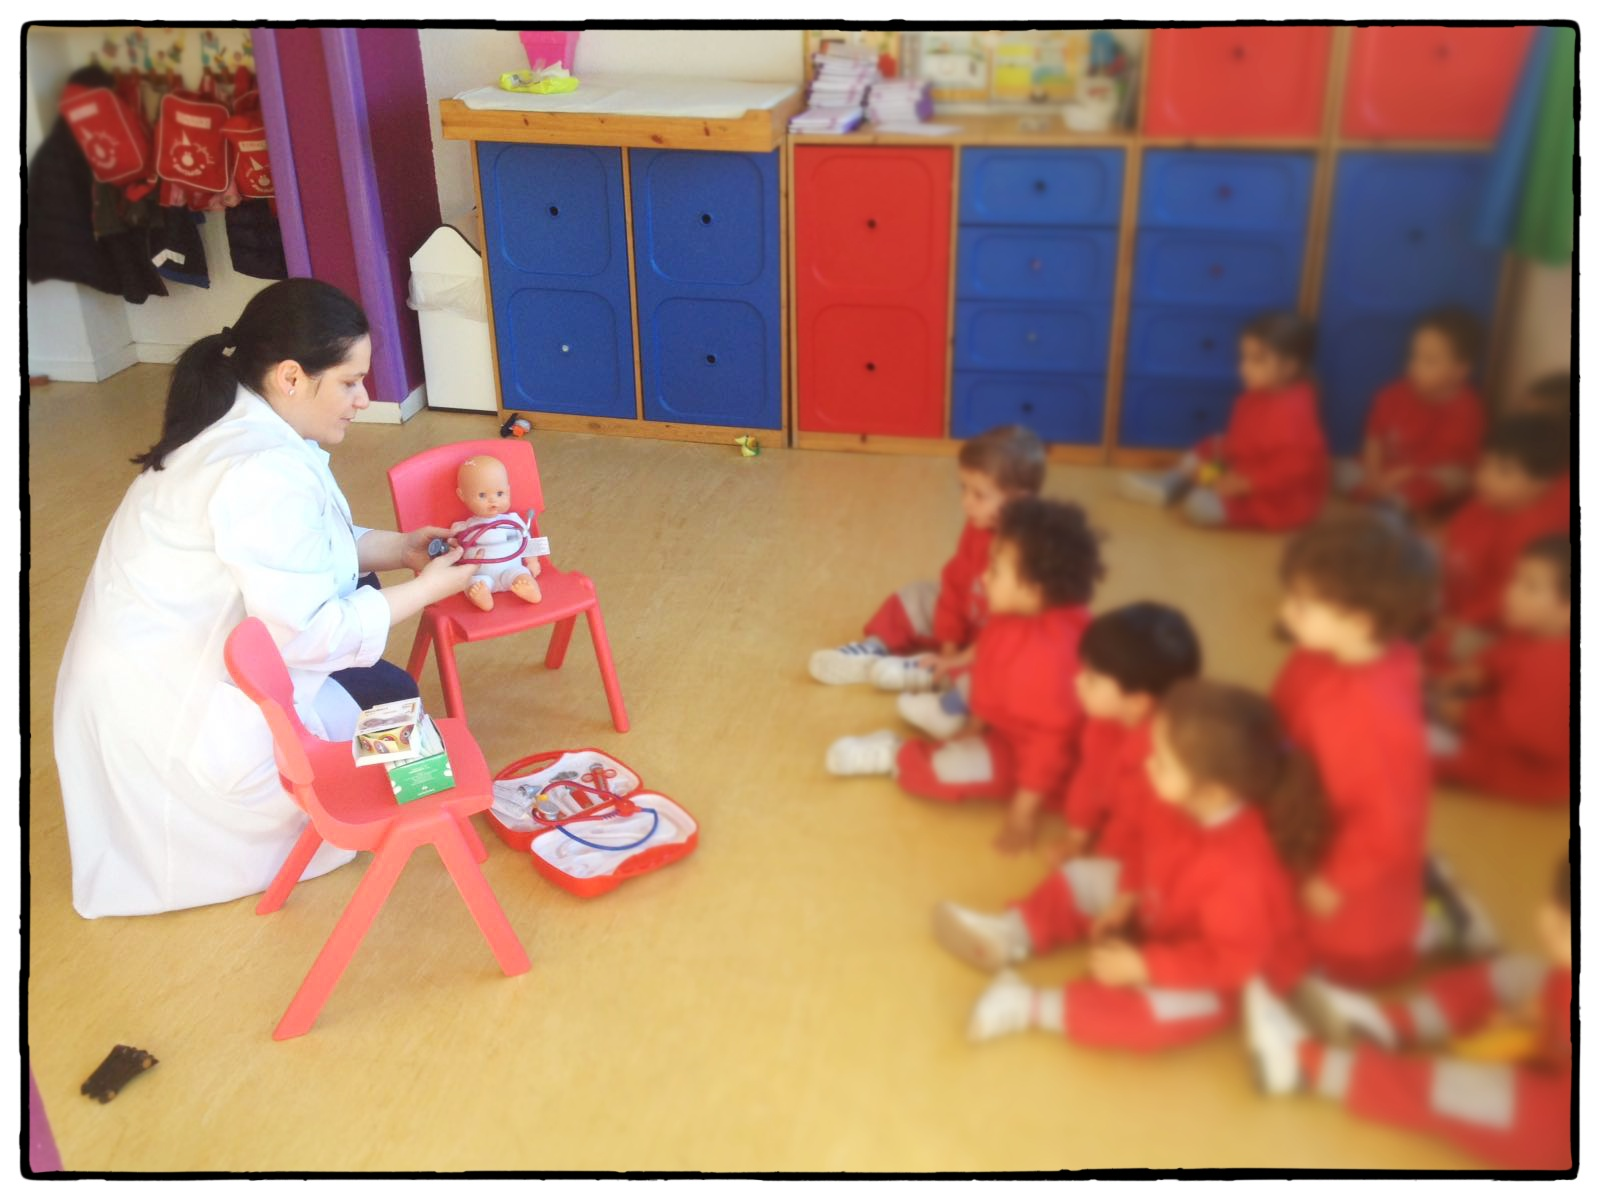 Escuela infantil piquio pozuelo pediatra visita piquio escuela infantil piquio pozuelo - Escuela infantil pozuelo ...